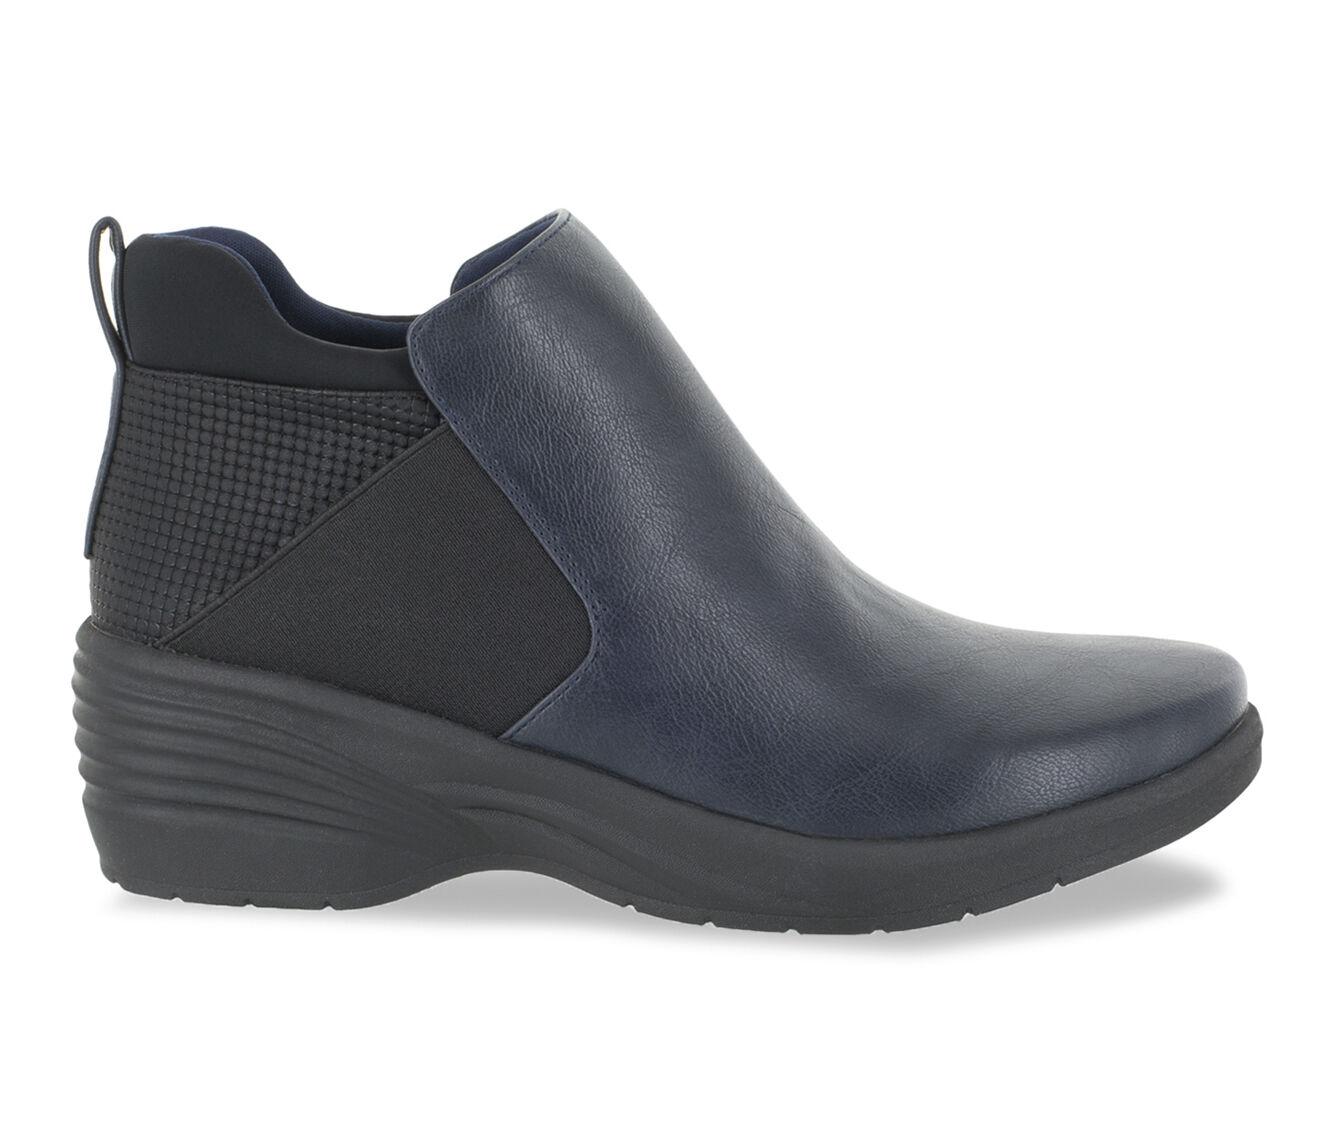 uk shoes_kd5734